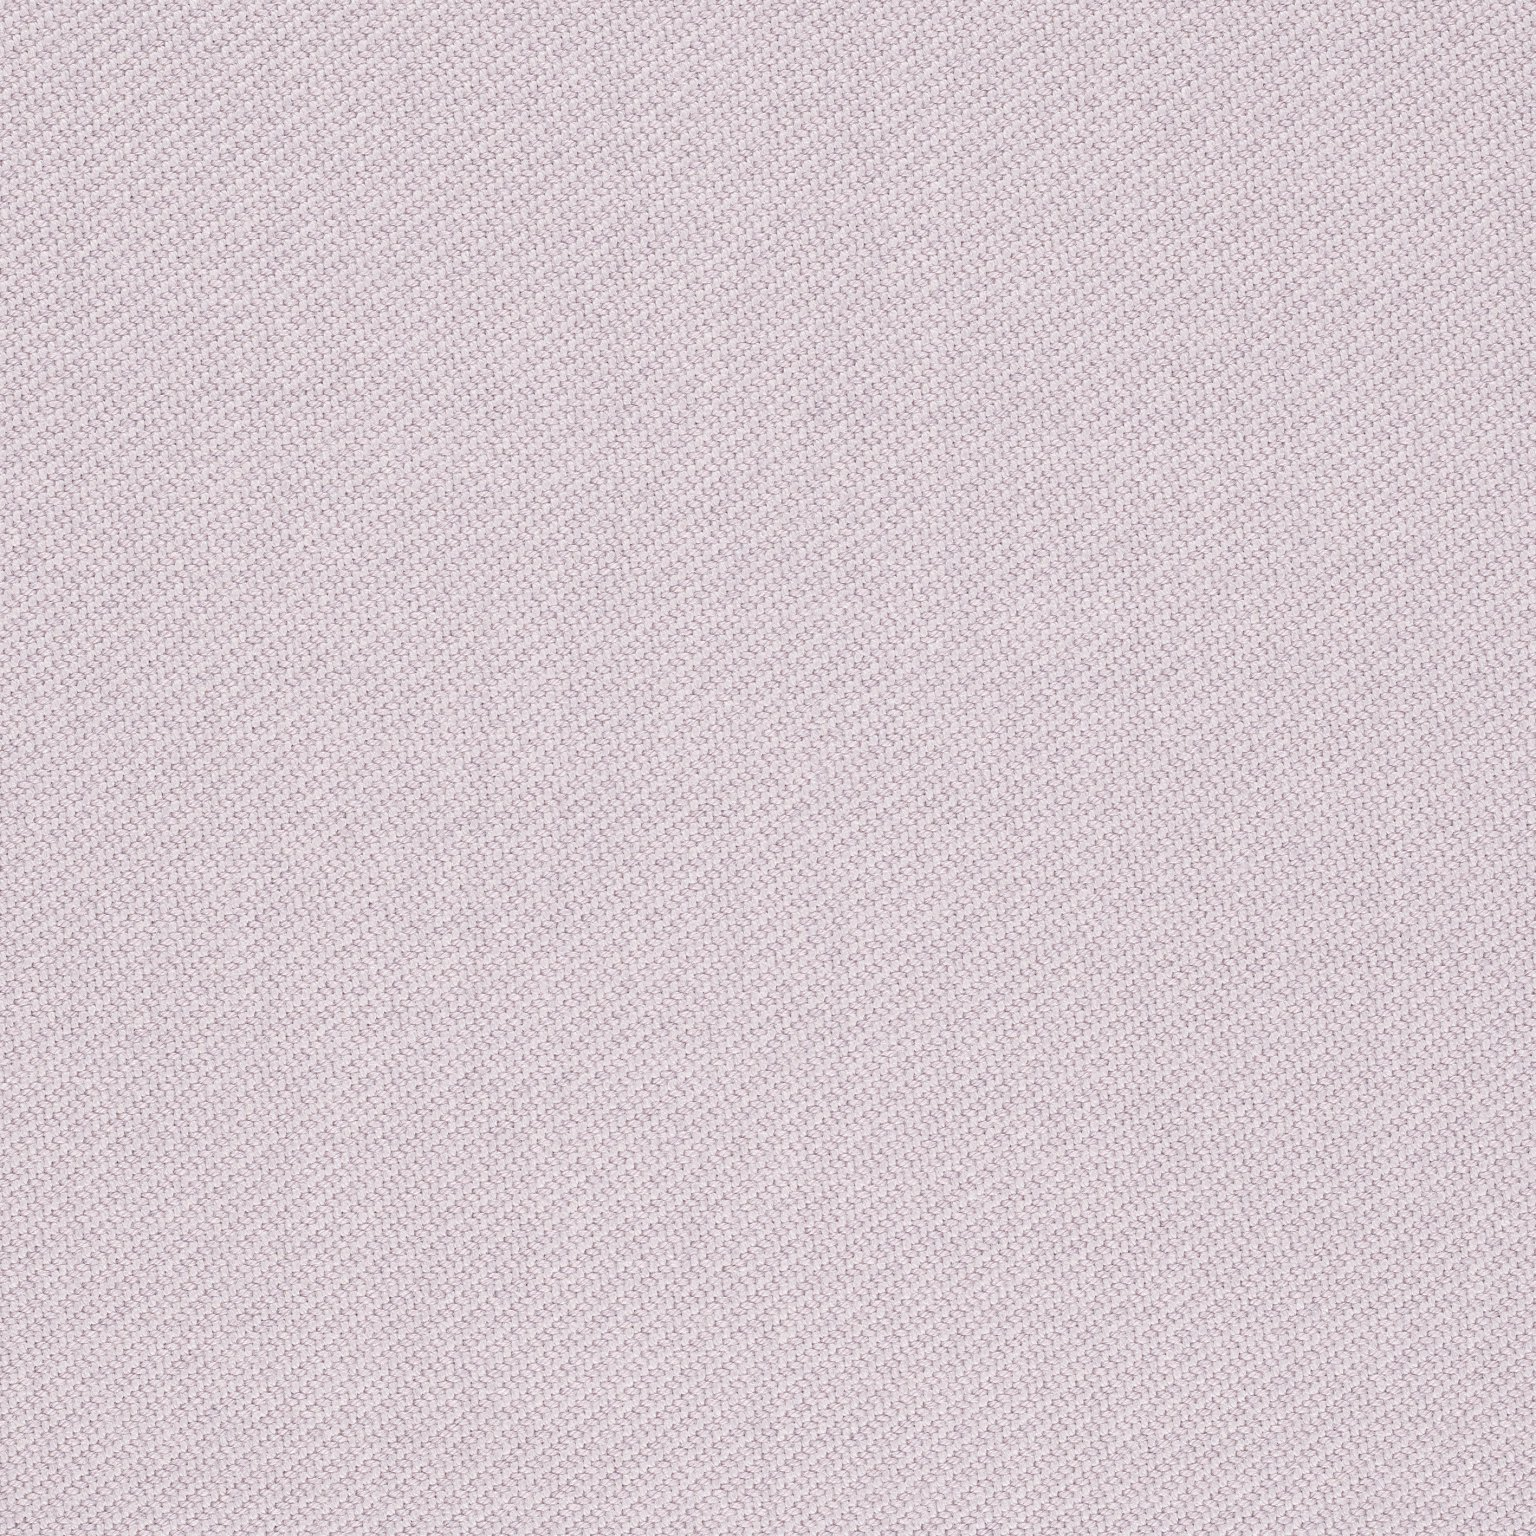 Kvadrat > Twill Weave 0620